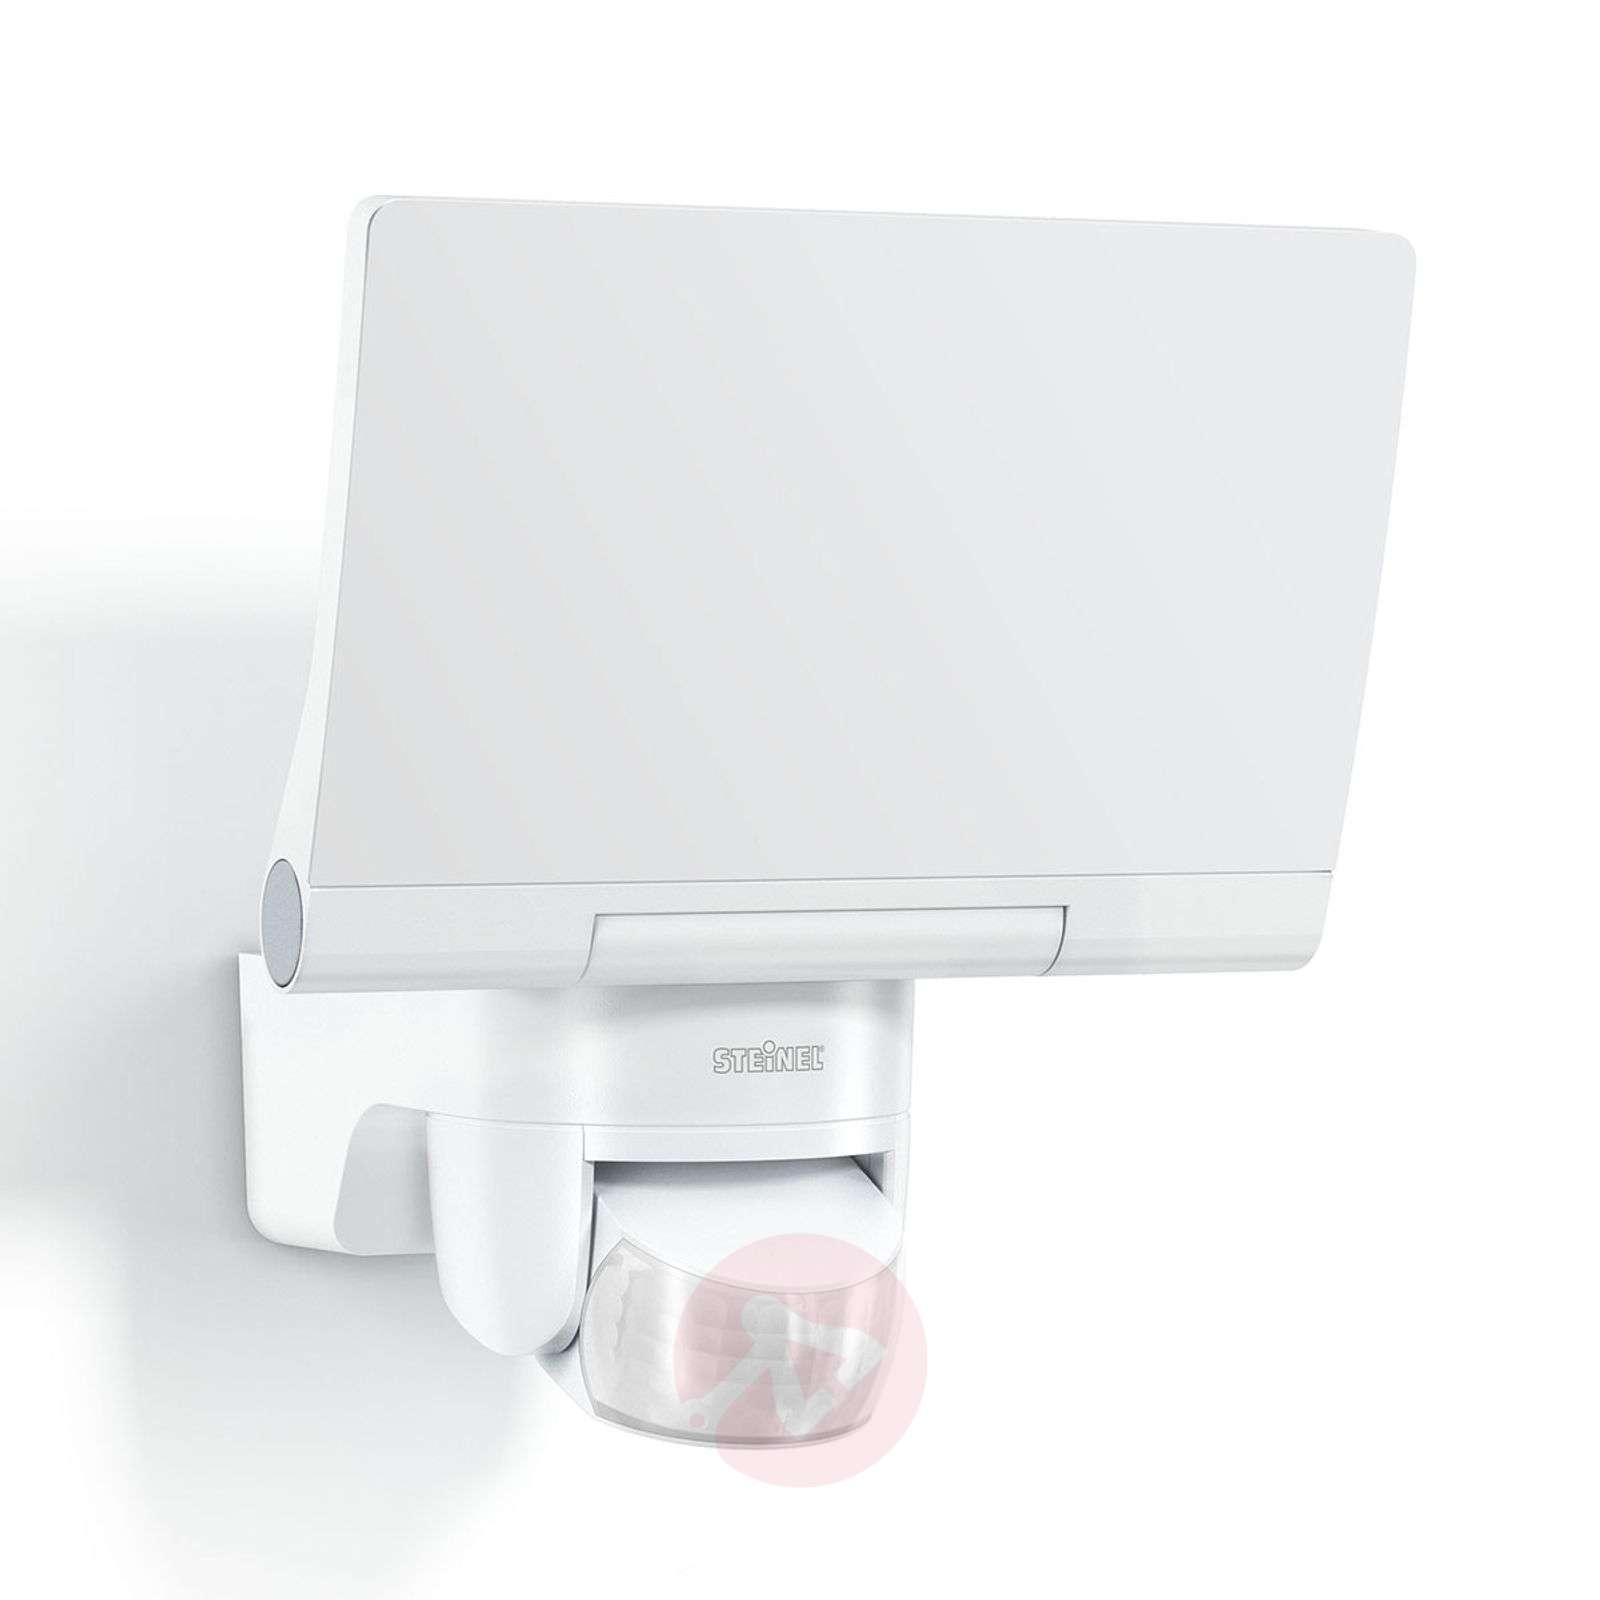 STEINEL XLED Home2 Smart Friends LED-kohdevalaisin-8505741X-02